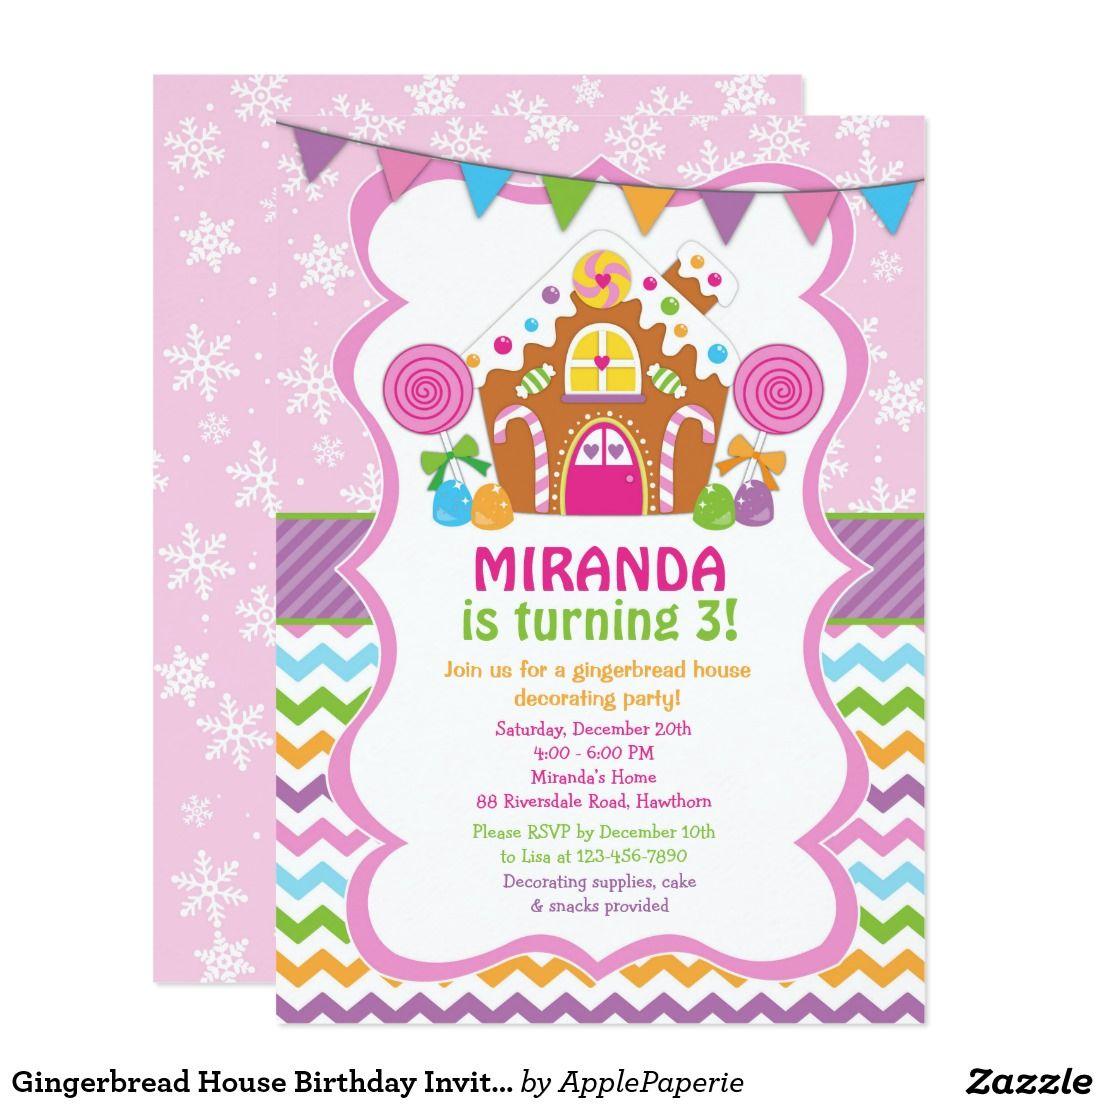 Gingerbread House Birthday Invitation | Christmas Party Invitations ...